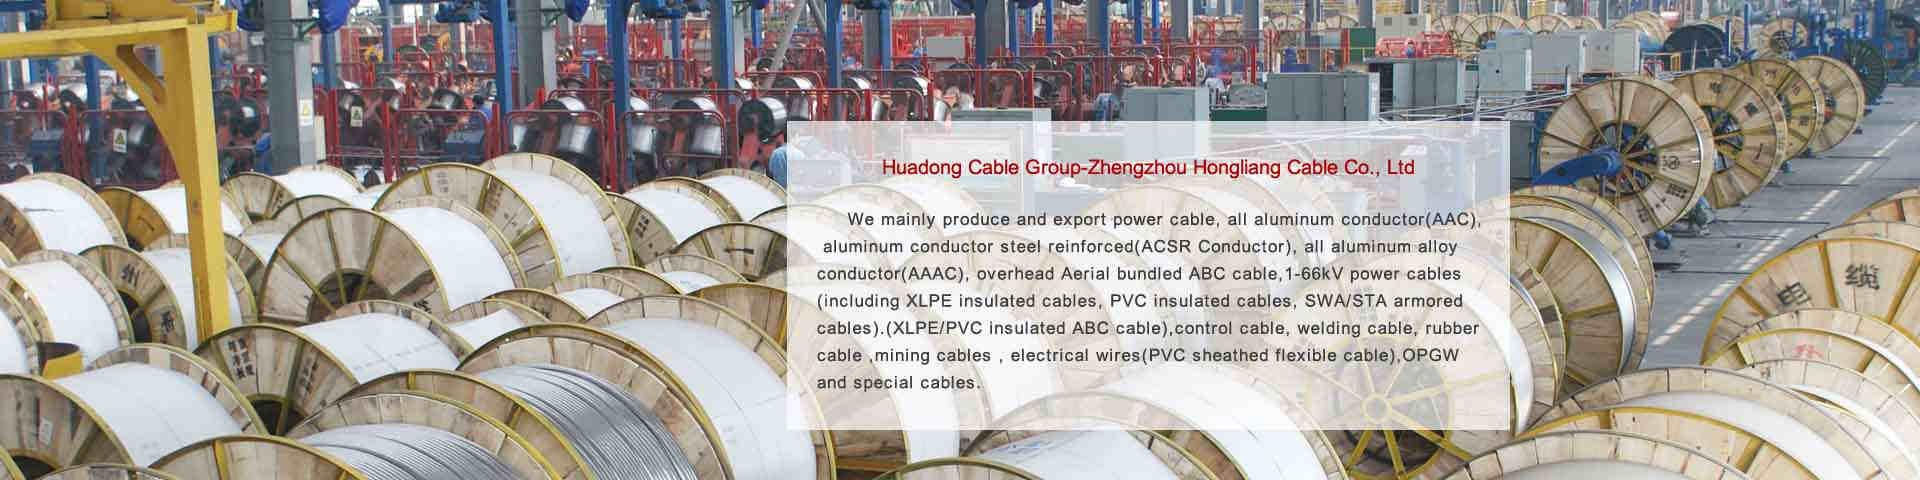 regular aerial bundled cable manufacturers